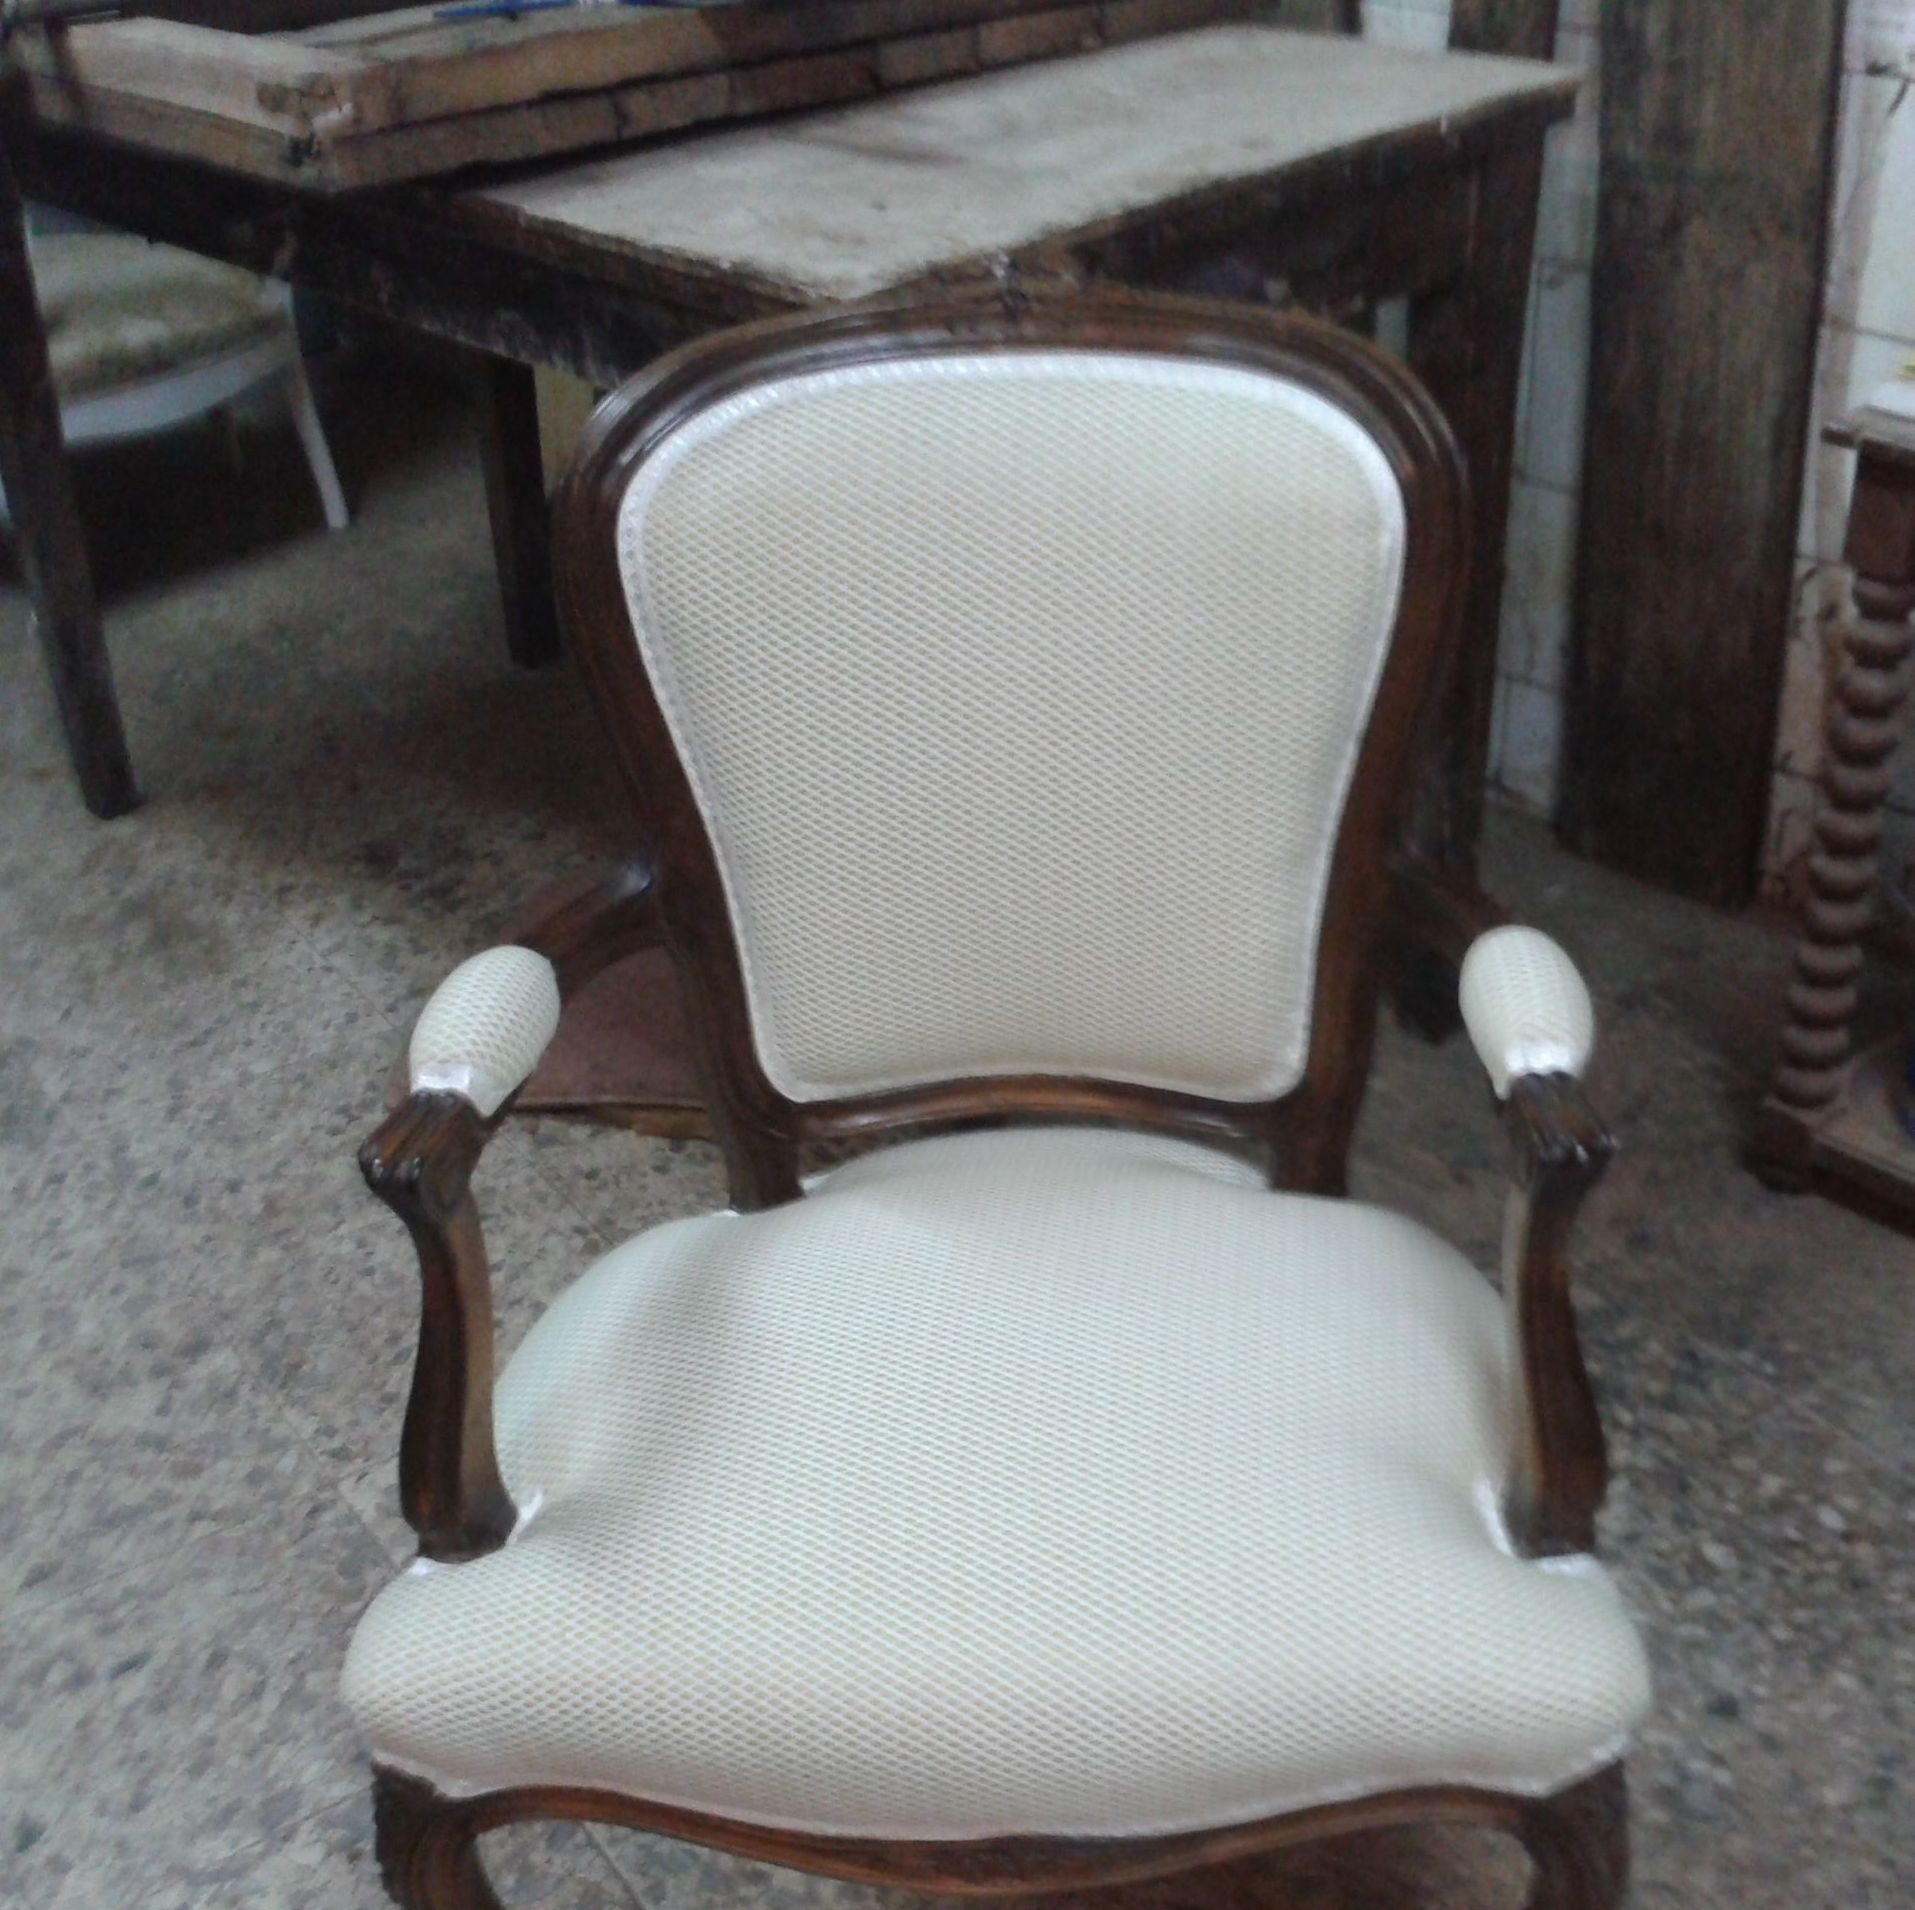 Foto 50 de Restauración de muebles en Pamplona | Lendik Restauración